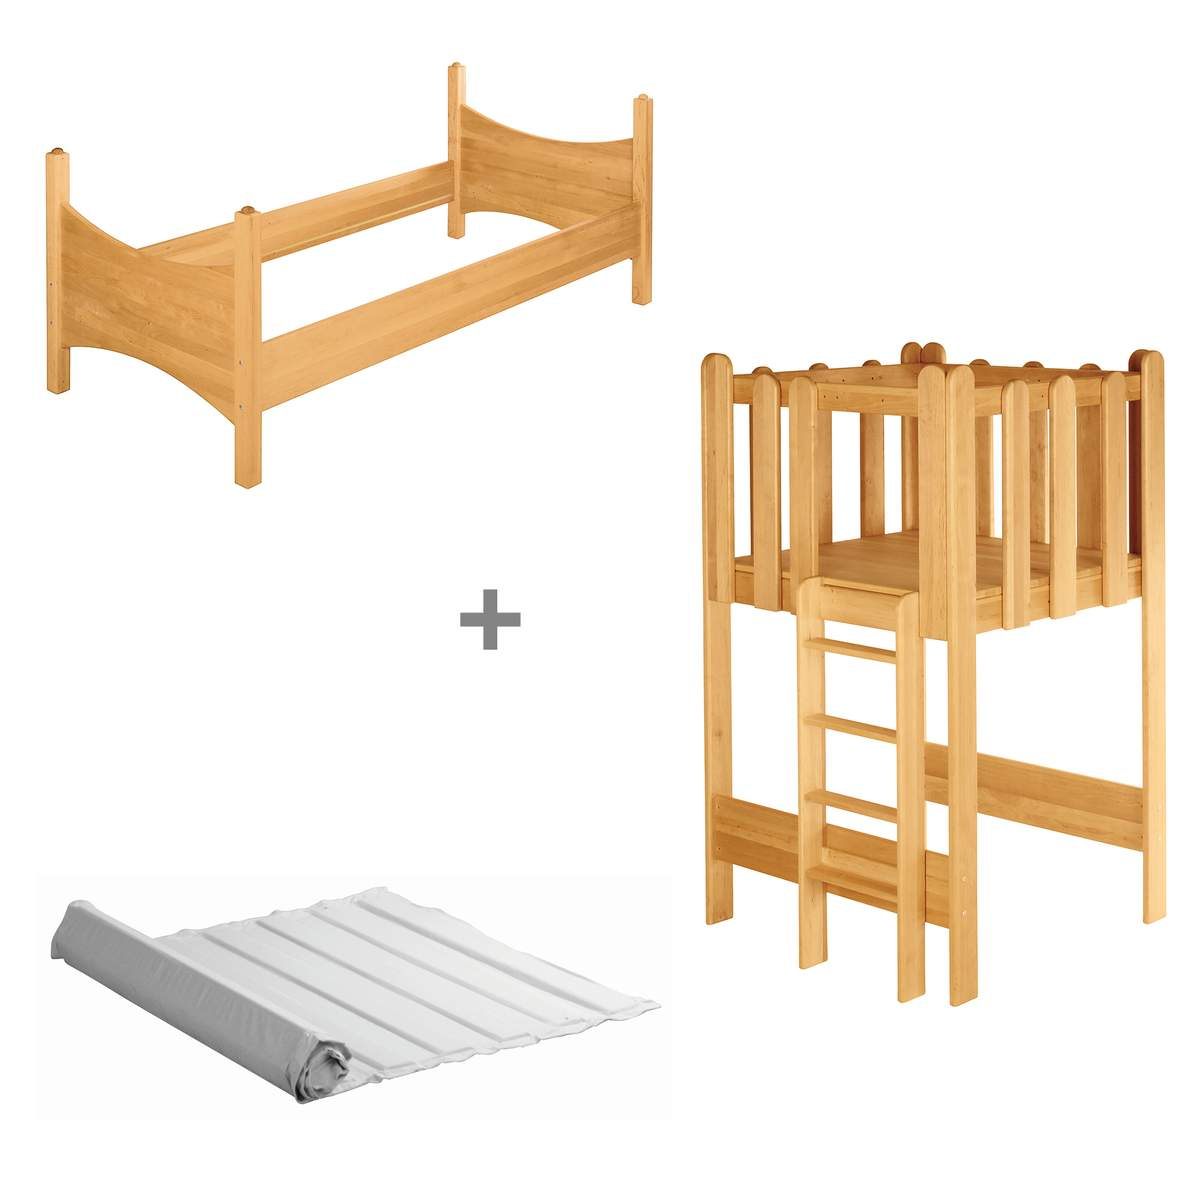 biokinder komplett set noah kinderbett mit spielturm erle. Black Bedroom Furniture Sets. Home Design Ideas